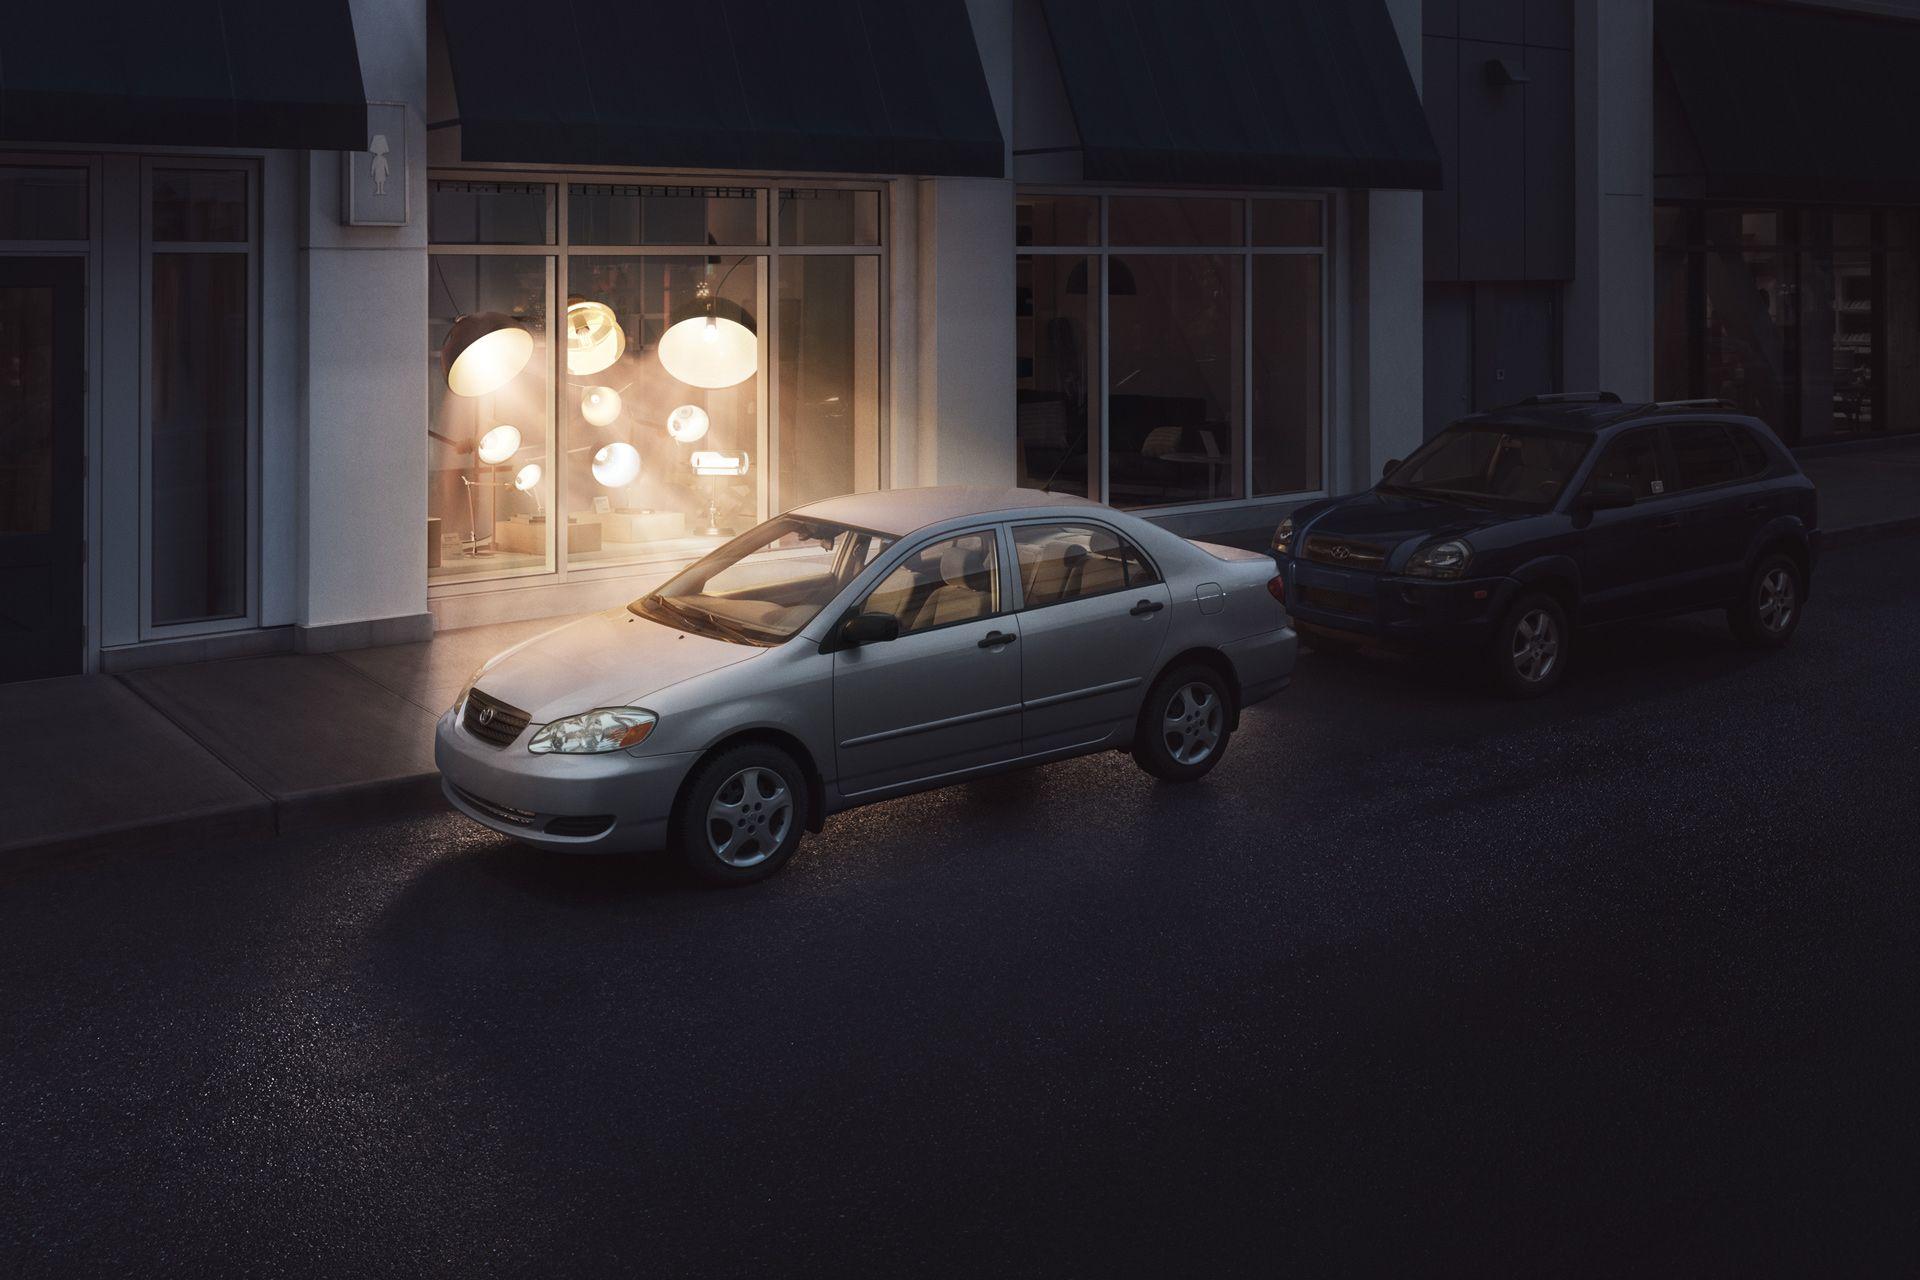 lights in a lamp shop bending to illuminate a grey car by Simon Duhamel for Sherlock